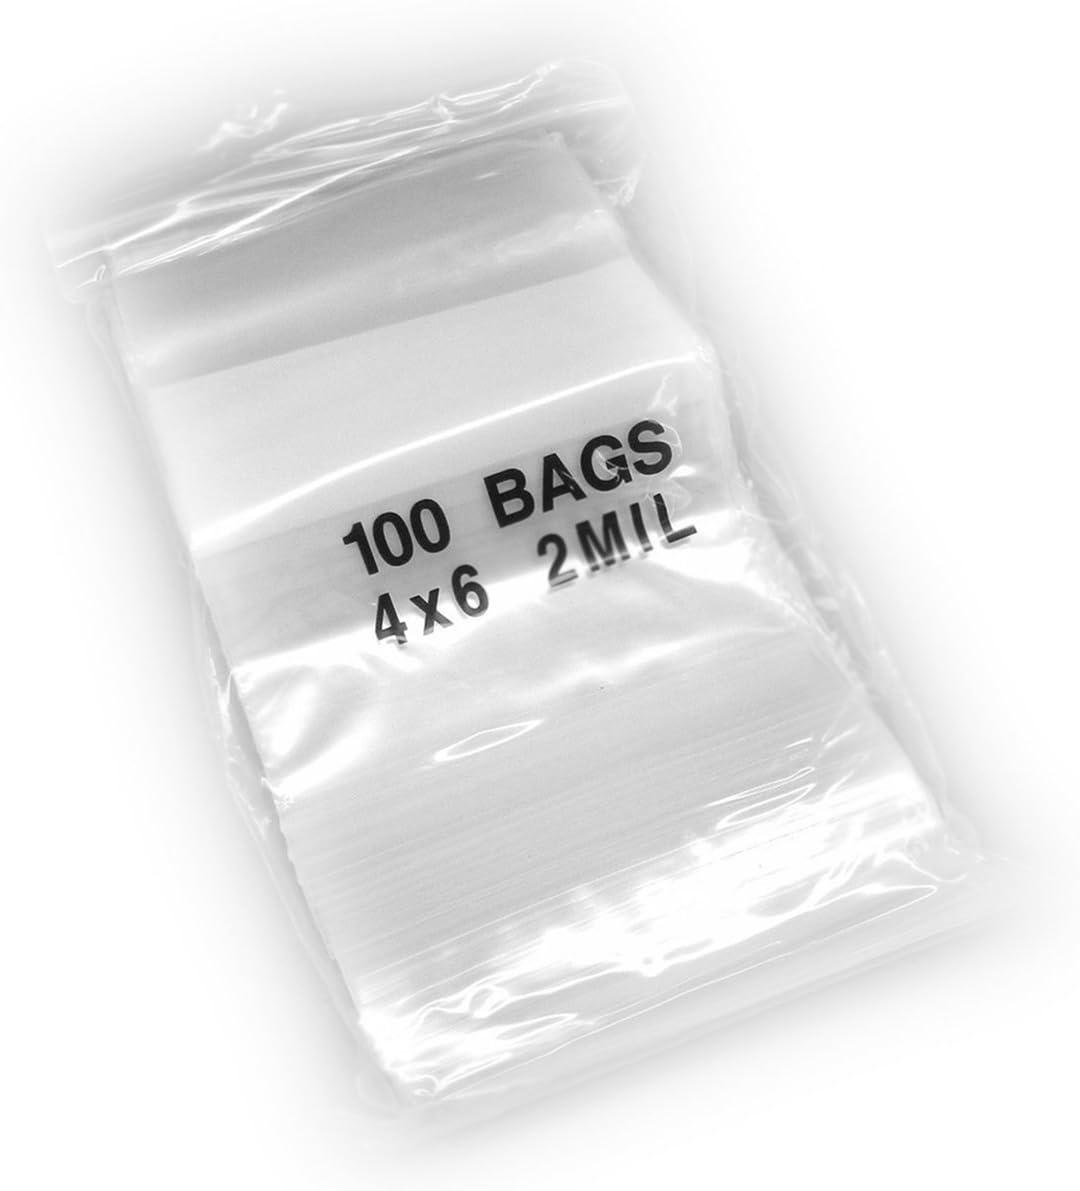 8-Mil Clear Ziplock Bags Heavy Duty Reclosable Plastic Zip Lock Baggies Zipper